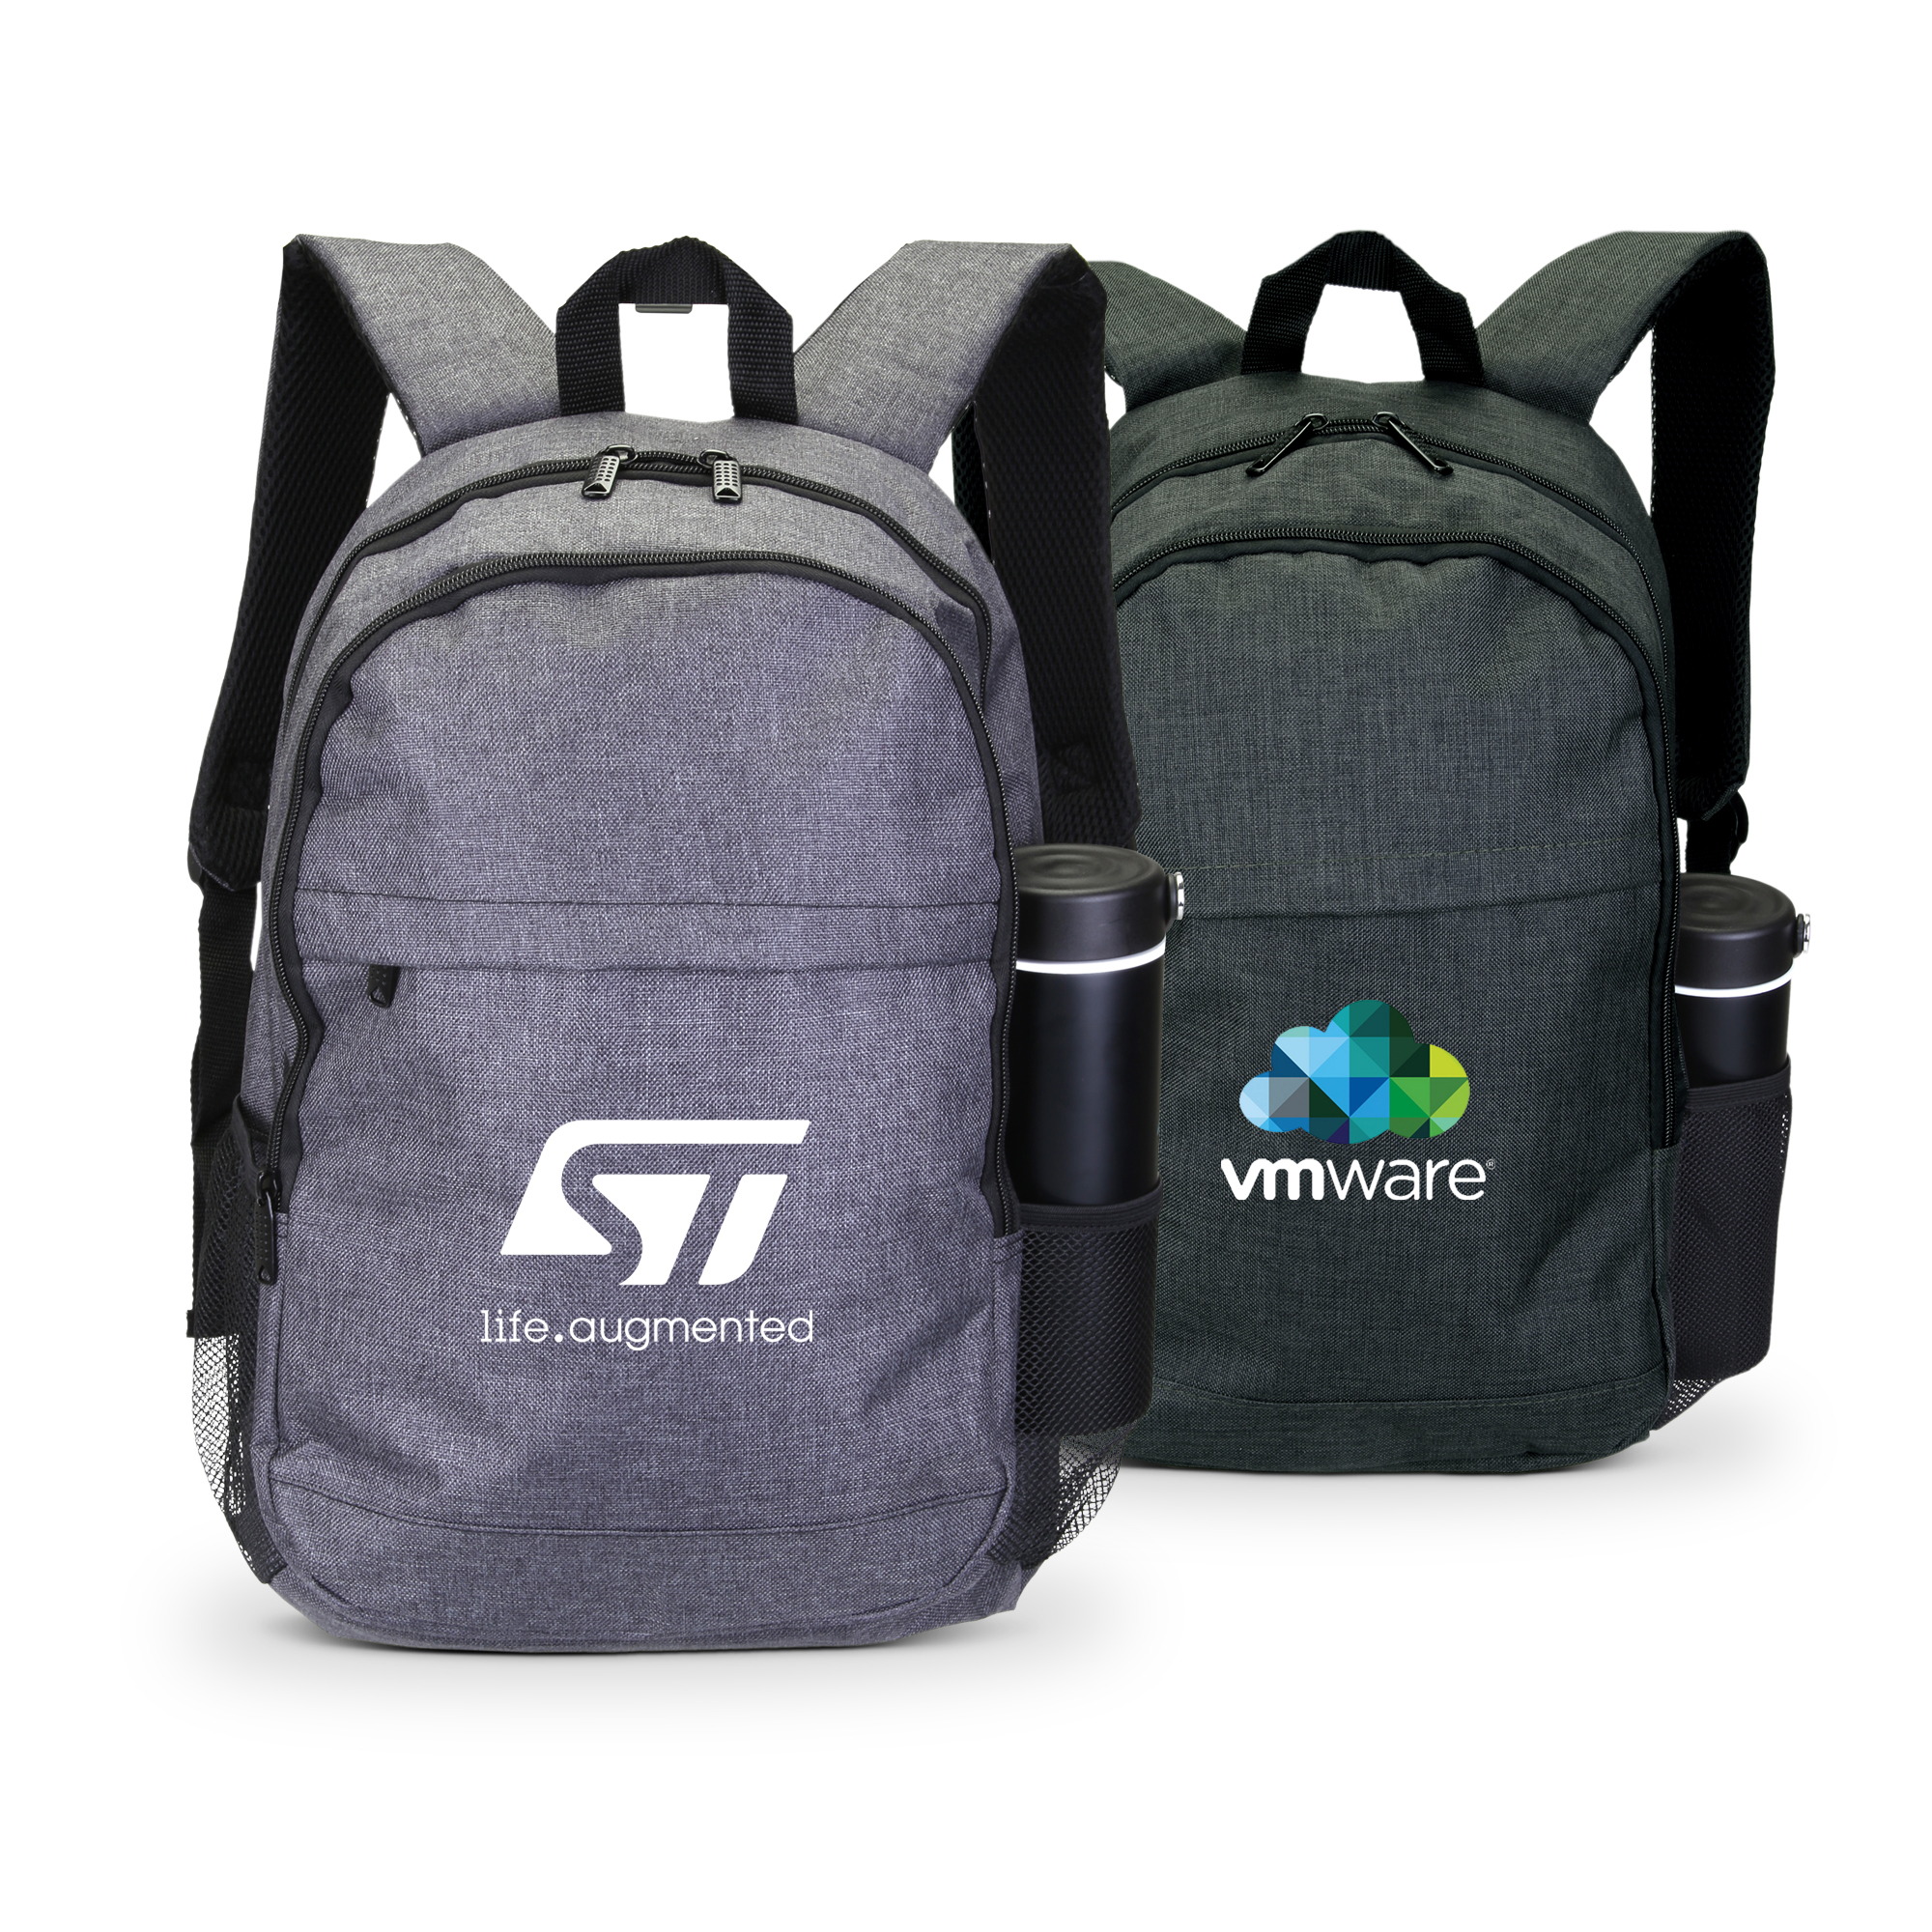 3528 Swank-Computer Backpack